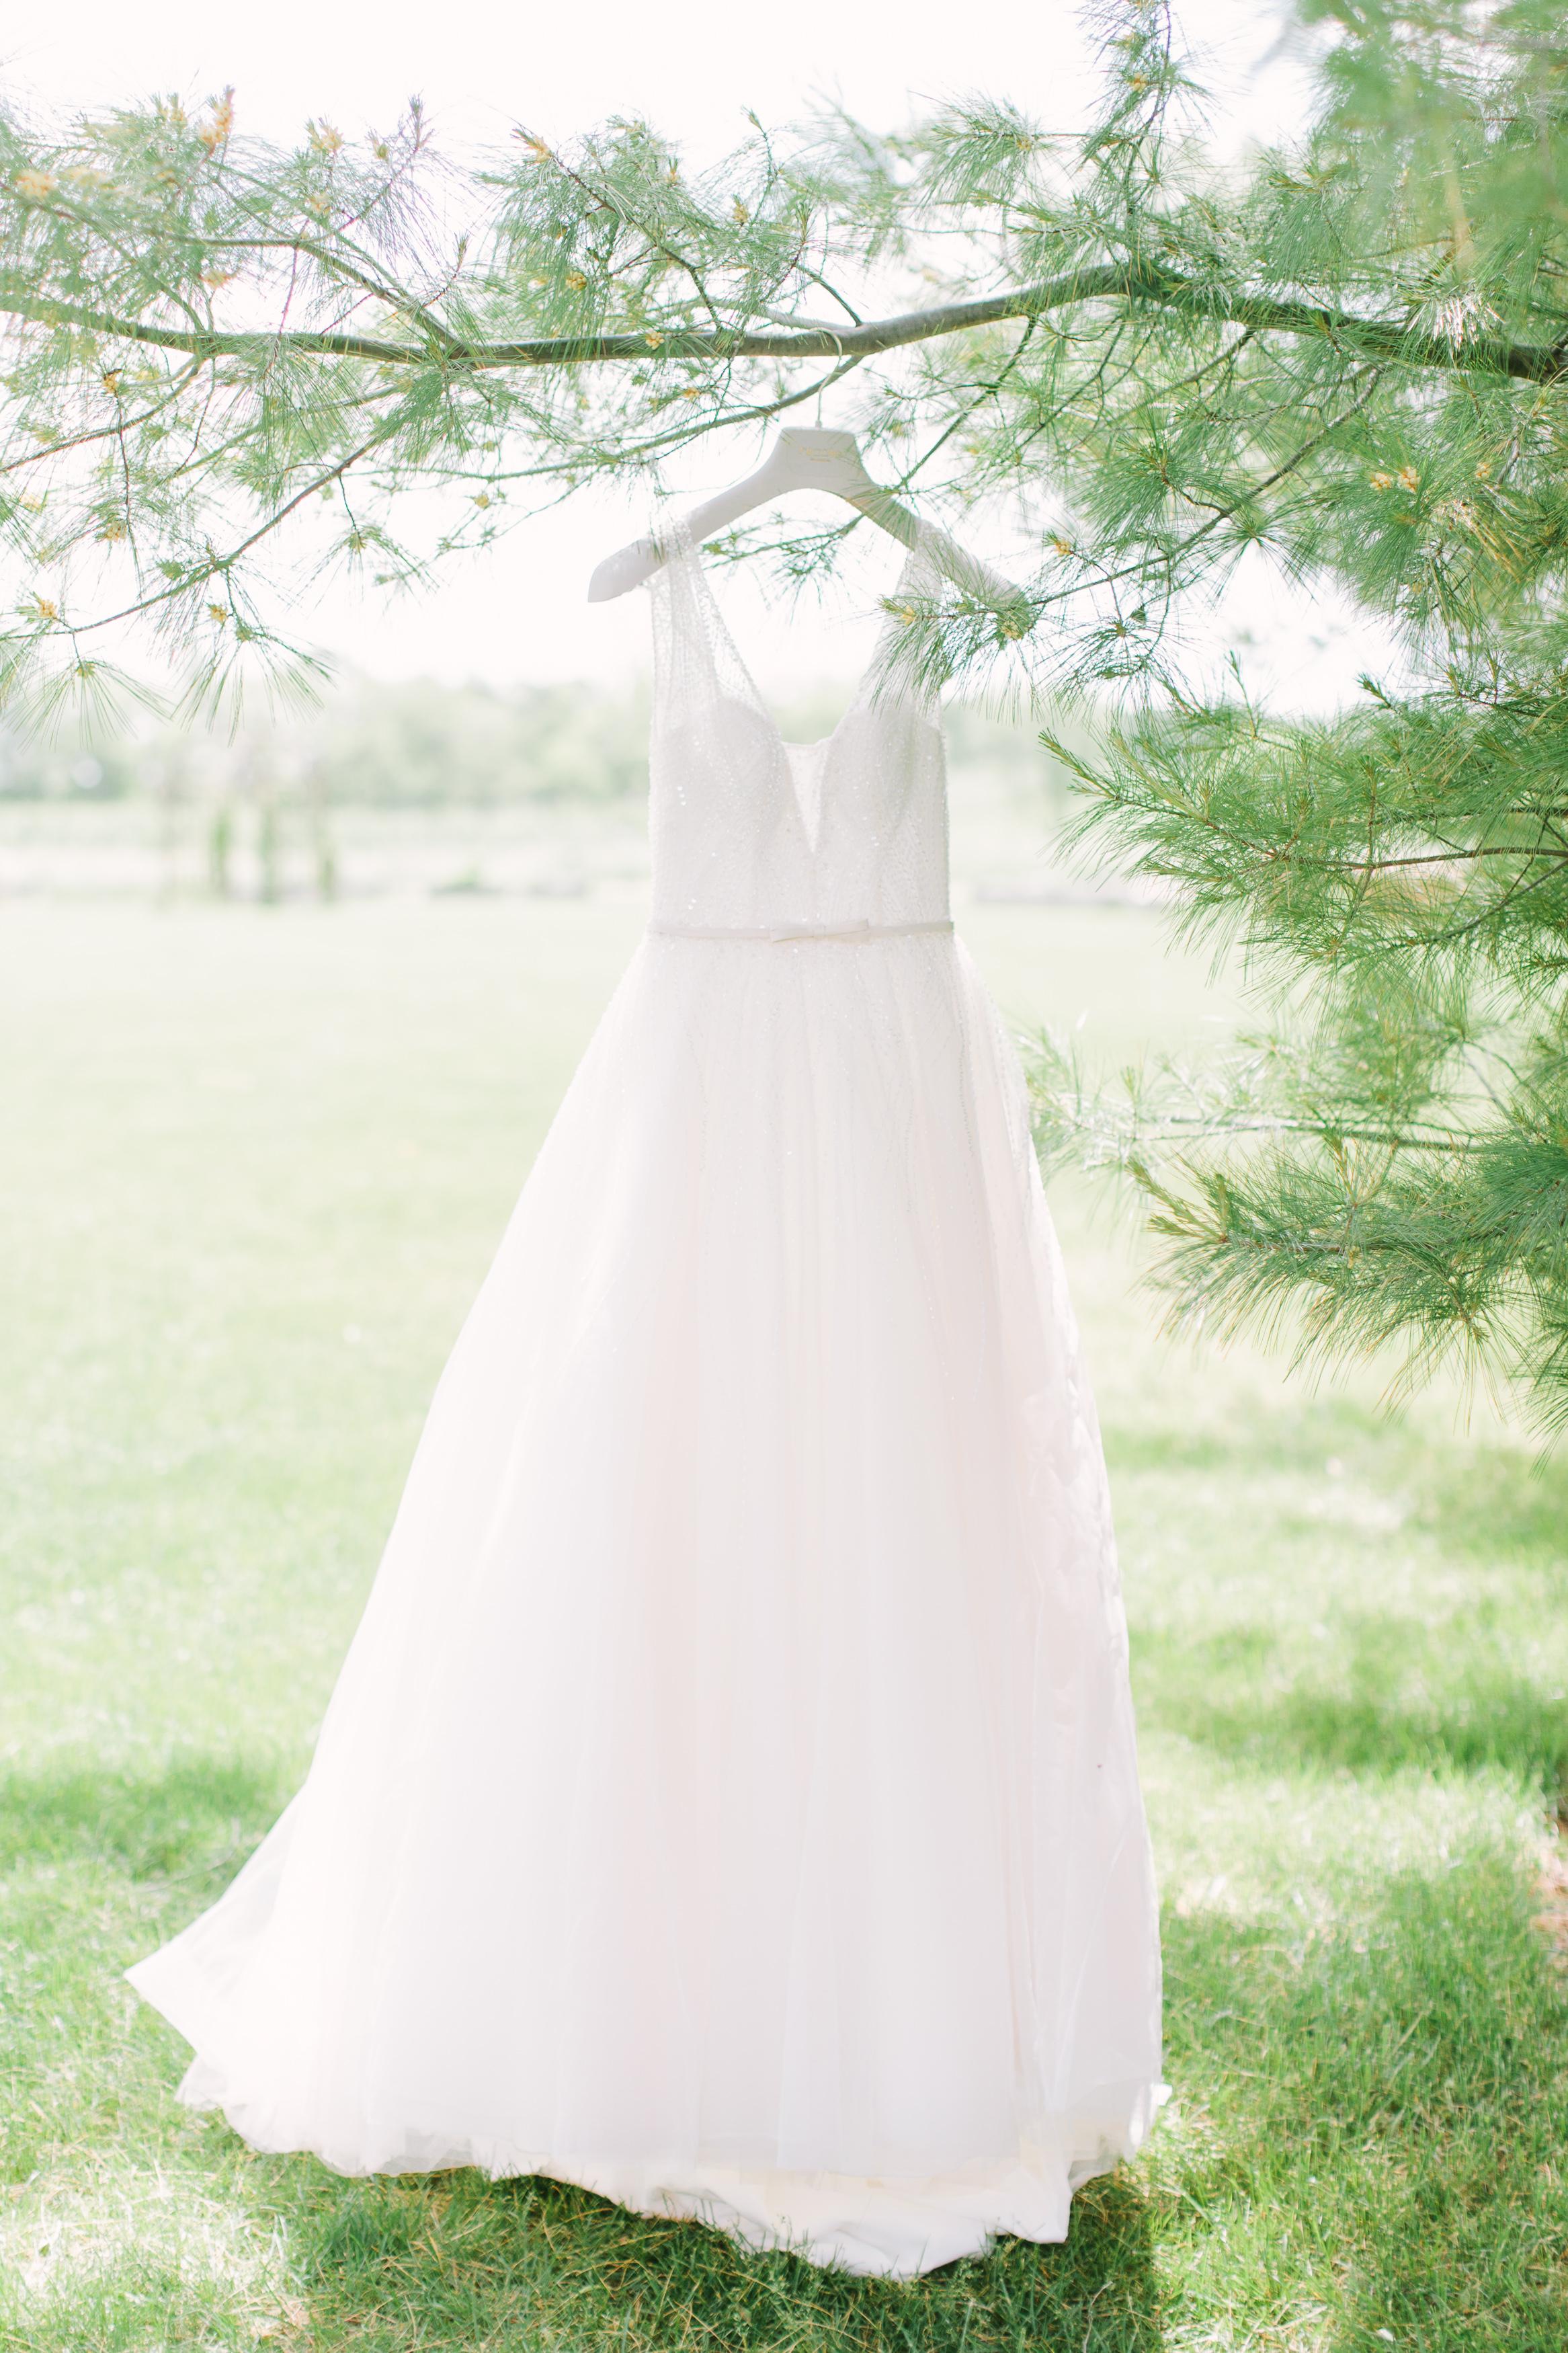 Nicodem Creative_Blog_Leung Wedding_The Pavilion at Orchad Ridge Farms_Rockton Illinois-3.jpg